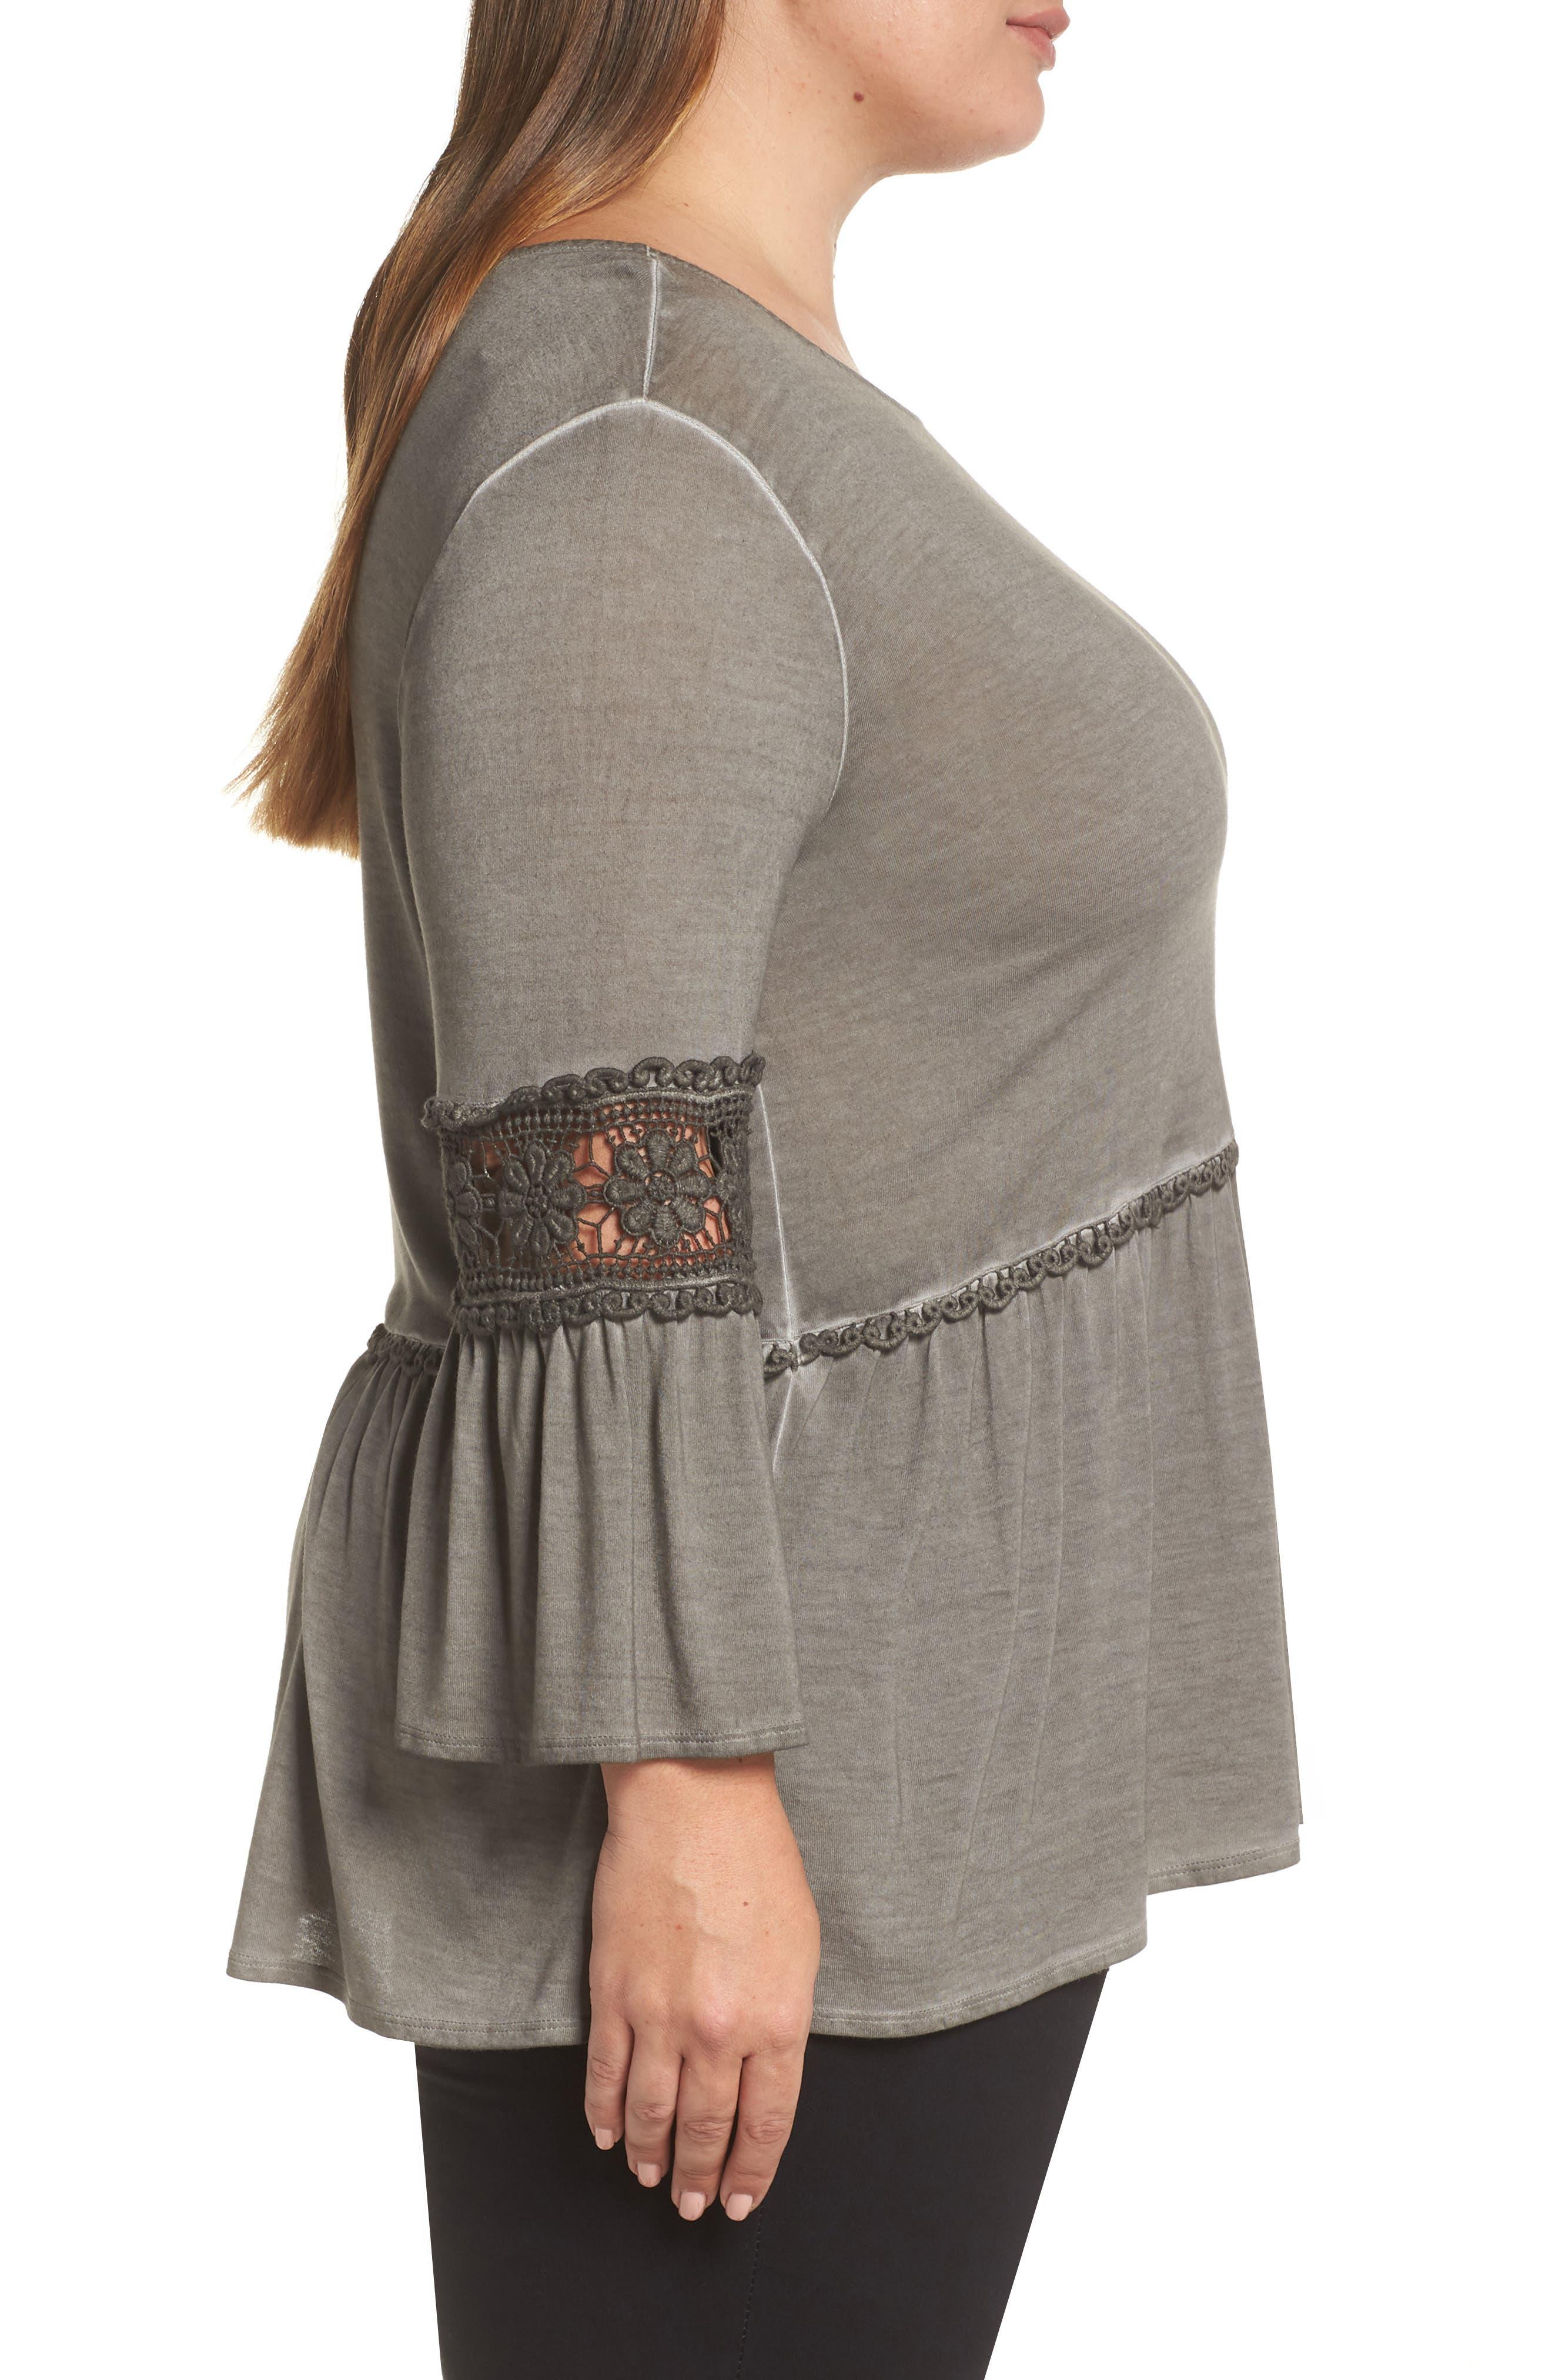 DANTELLE,                             Oil Dye Knit Lace Inset Top,                             Alternate thumbnail 3, color,                             FALCON